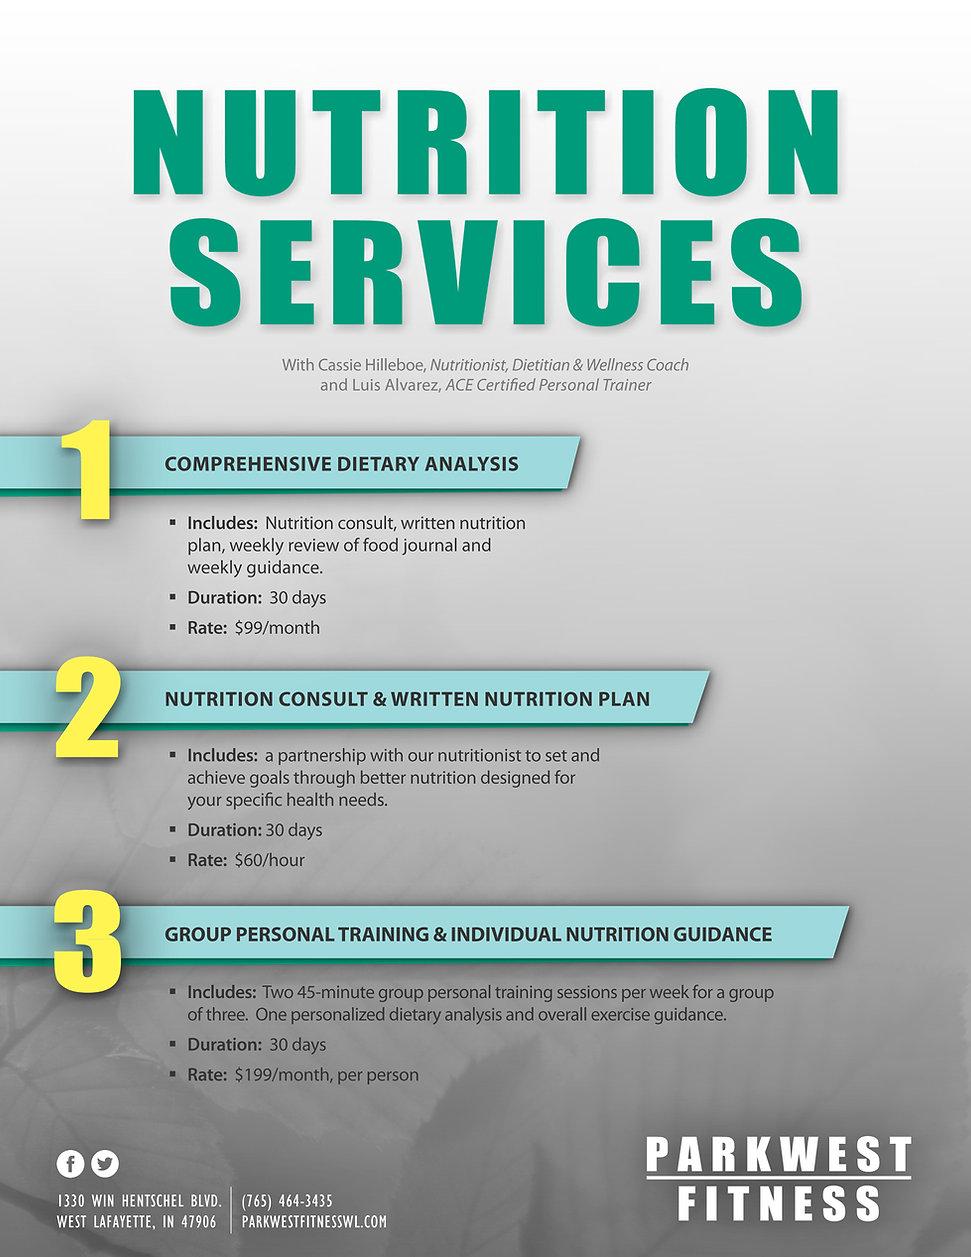 PWF-Nutrition-Services_v6_WEB.jpg